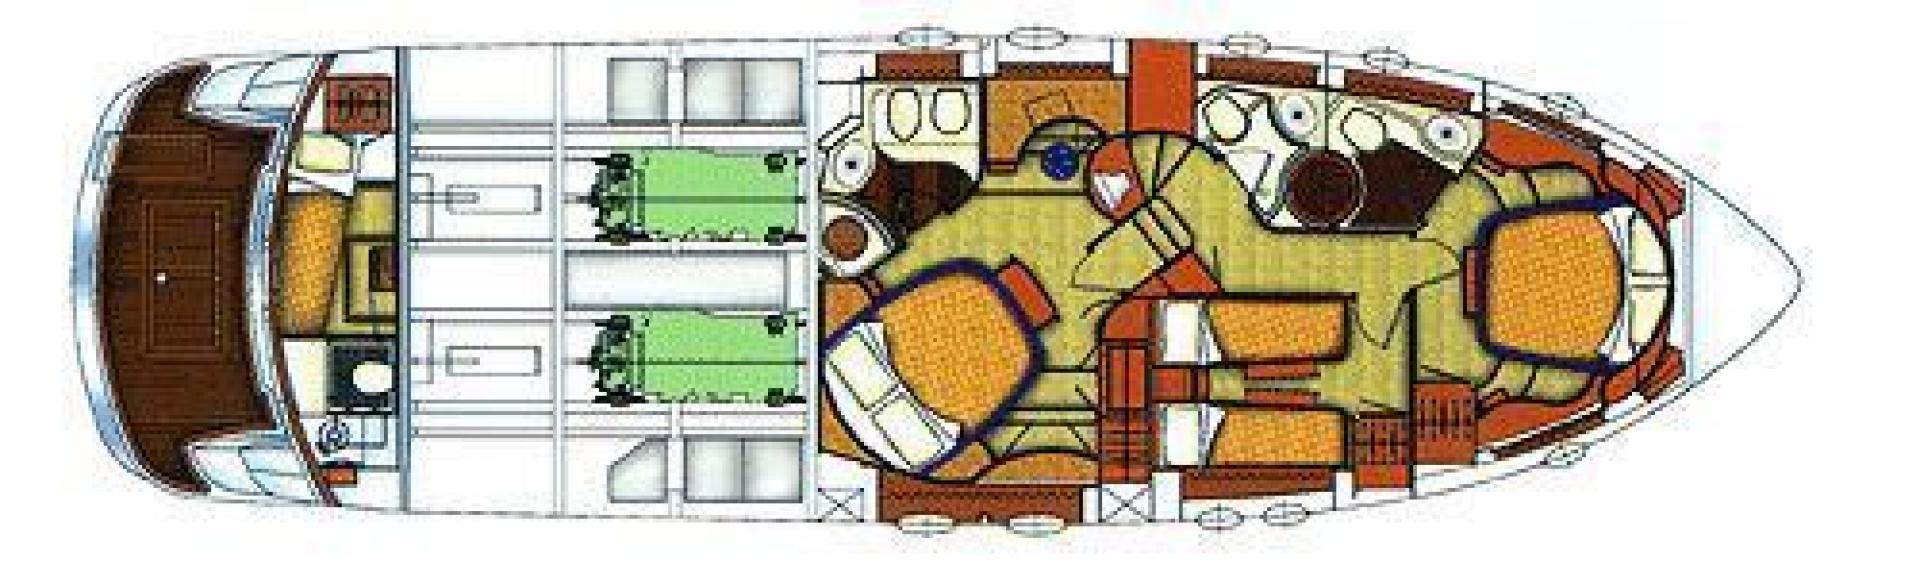 Aicon 2004-Dreamers Coral Gables-Florida-United States-1297738   Thumbnail